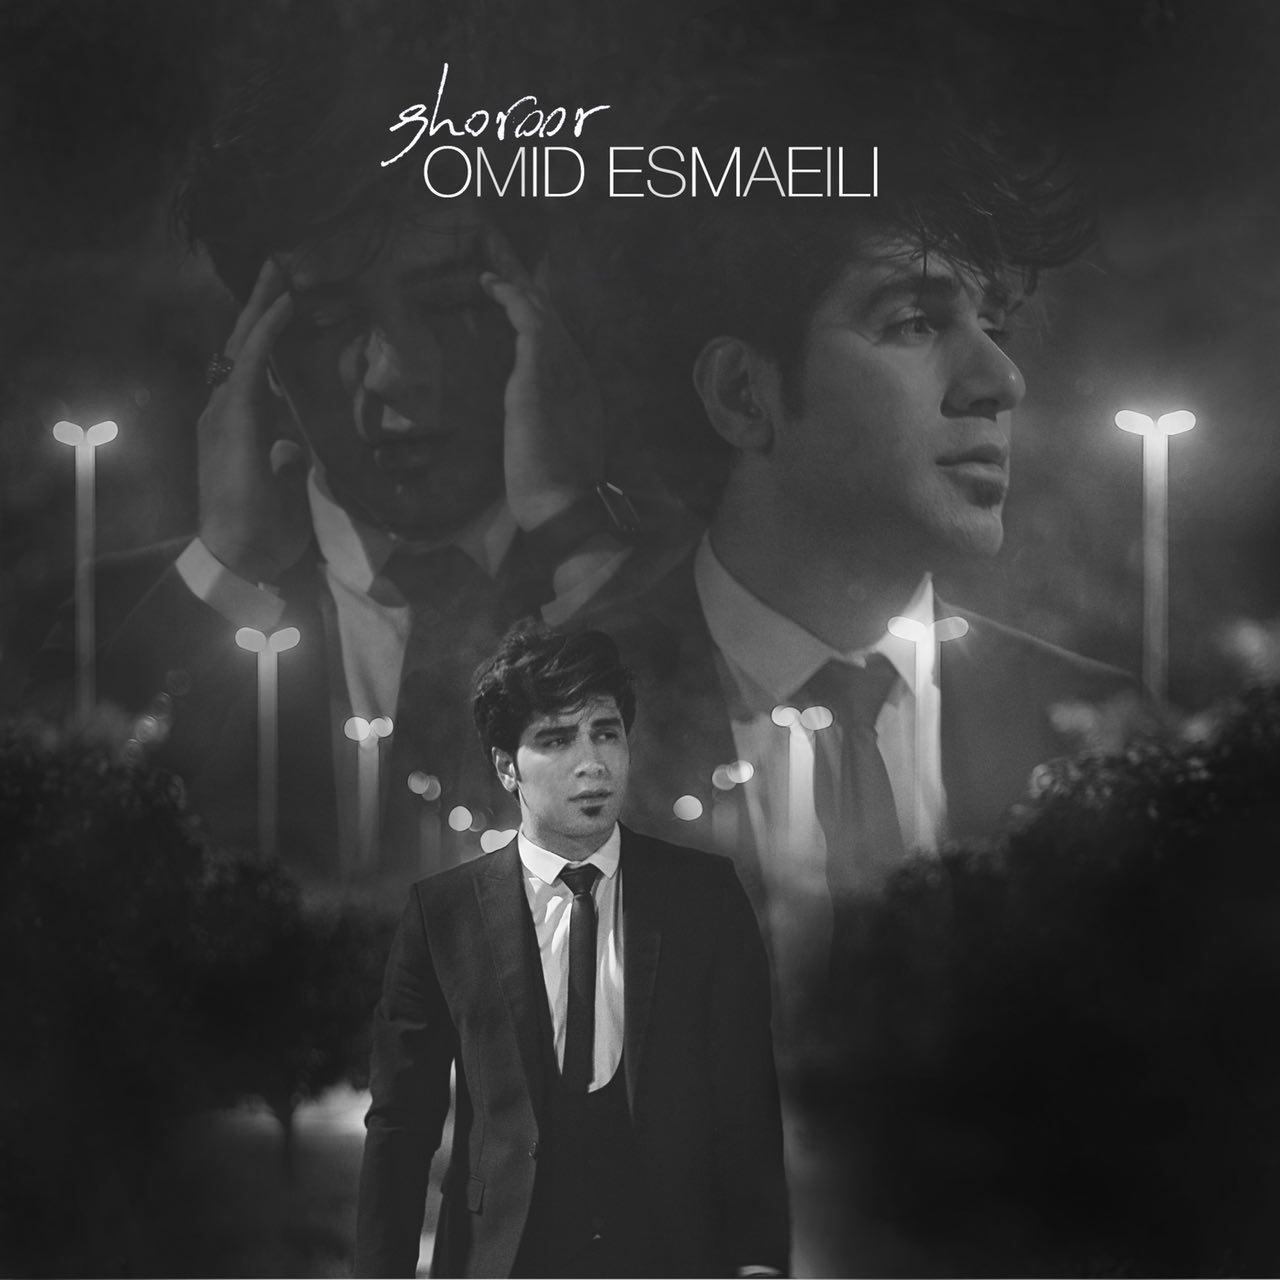 Omid Esmaili – Ghoror